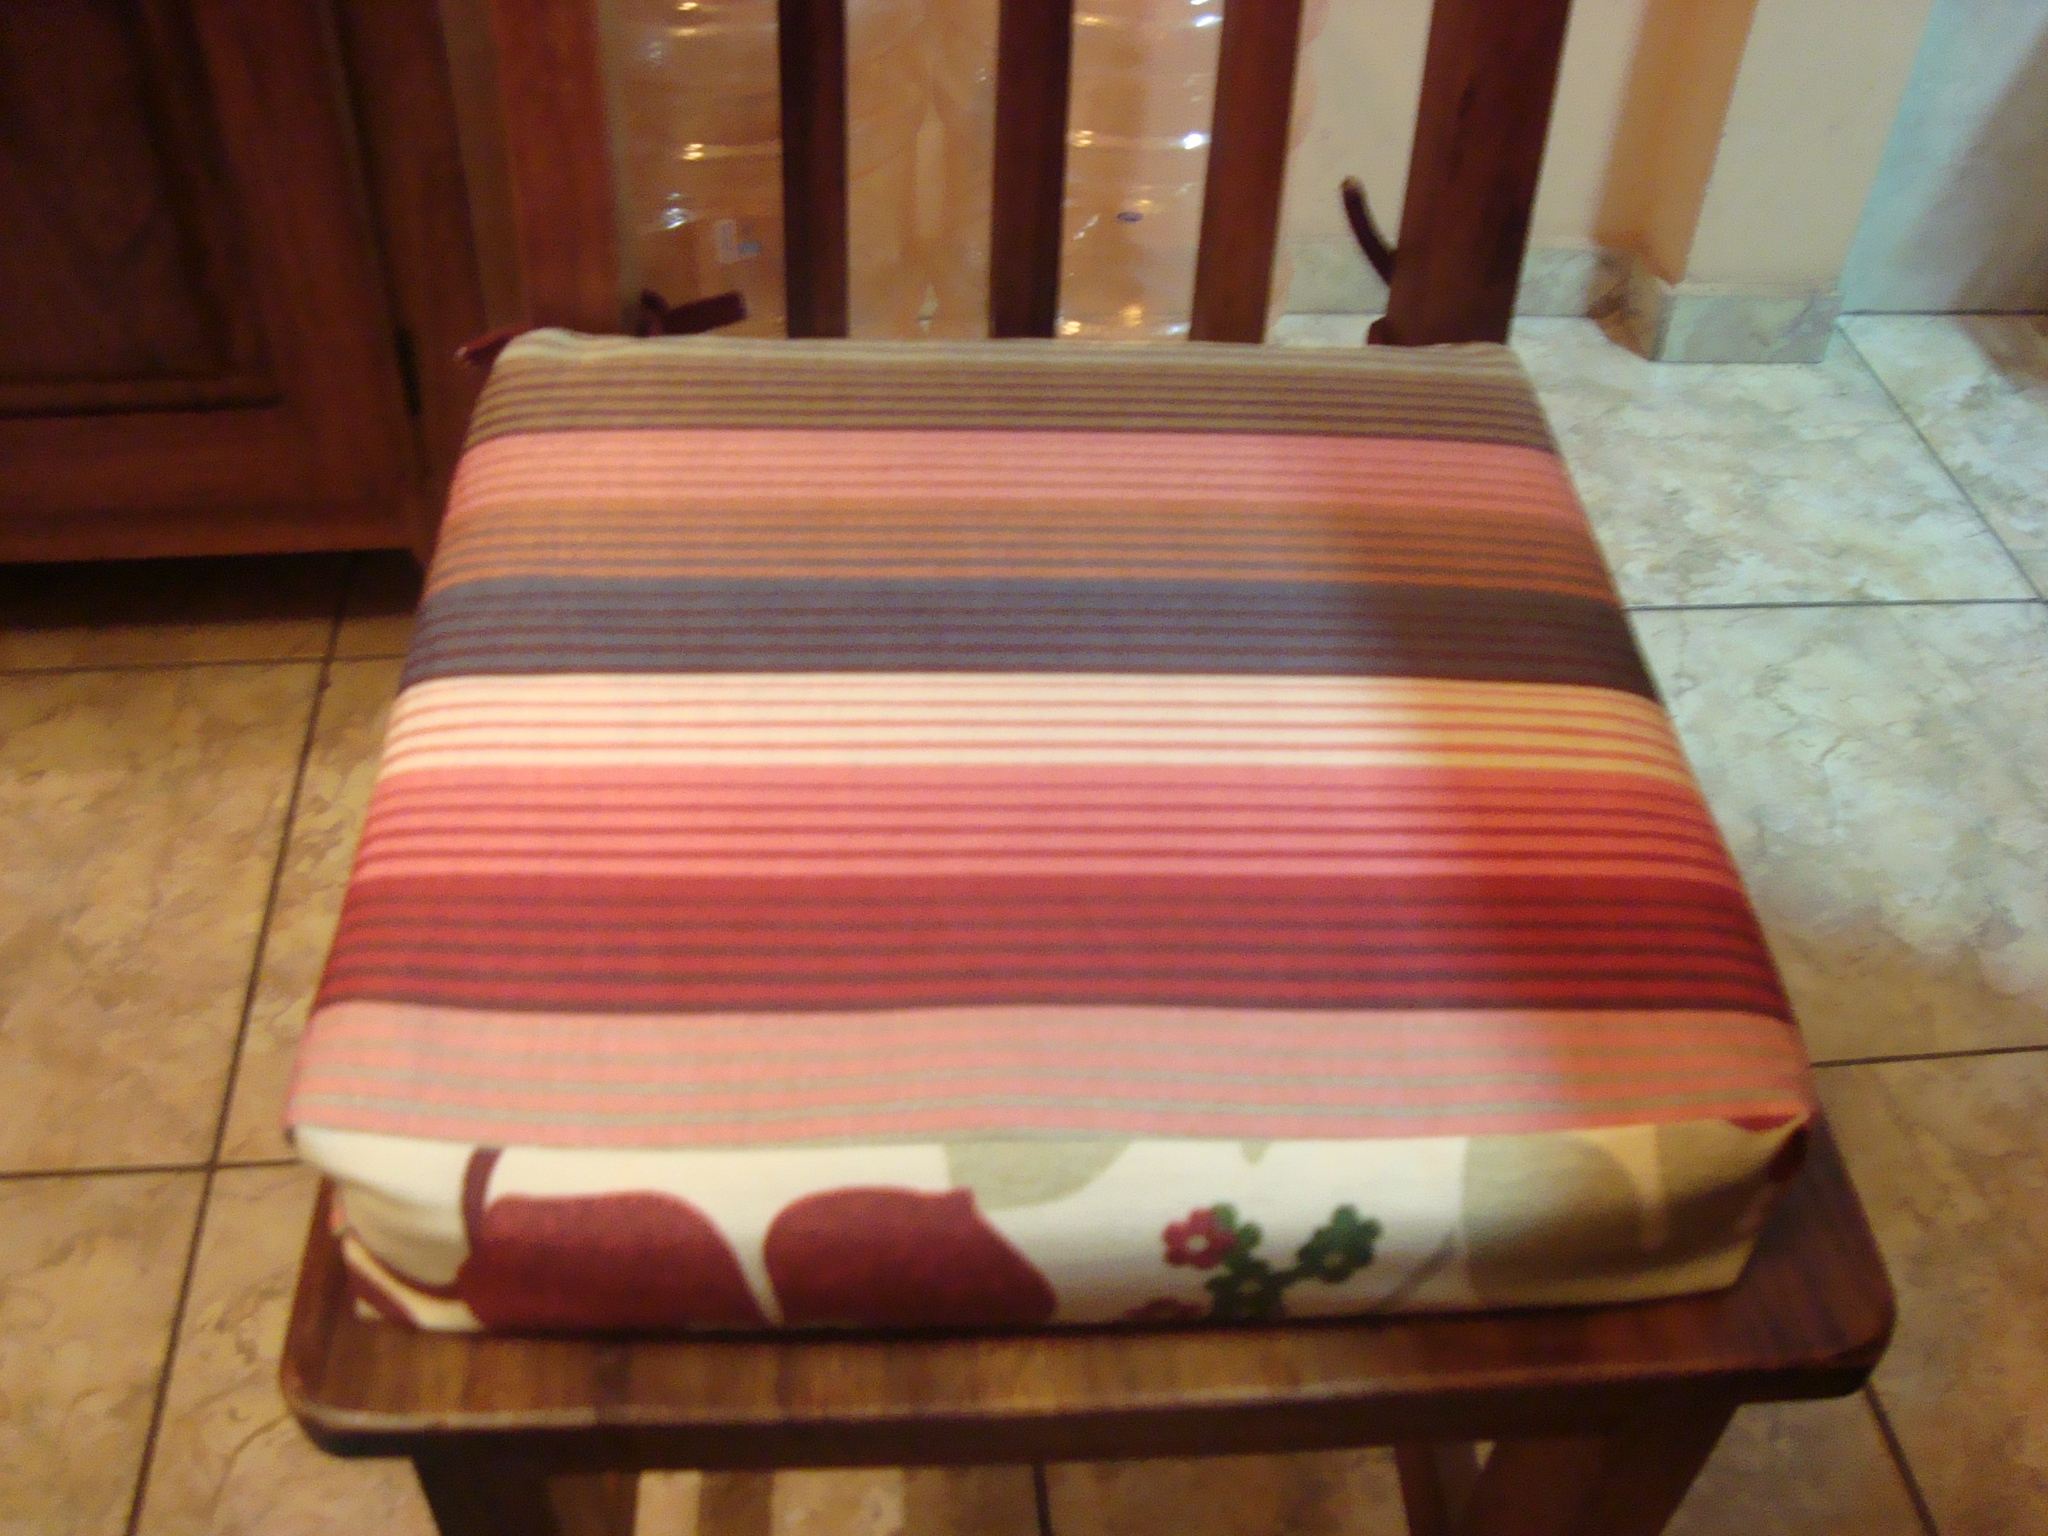 almofada de cadeira projetos projeto almofada de cadeira moldes #38180F 2048x1536